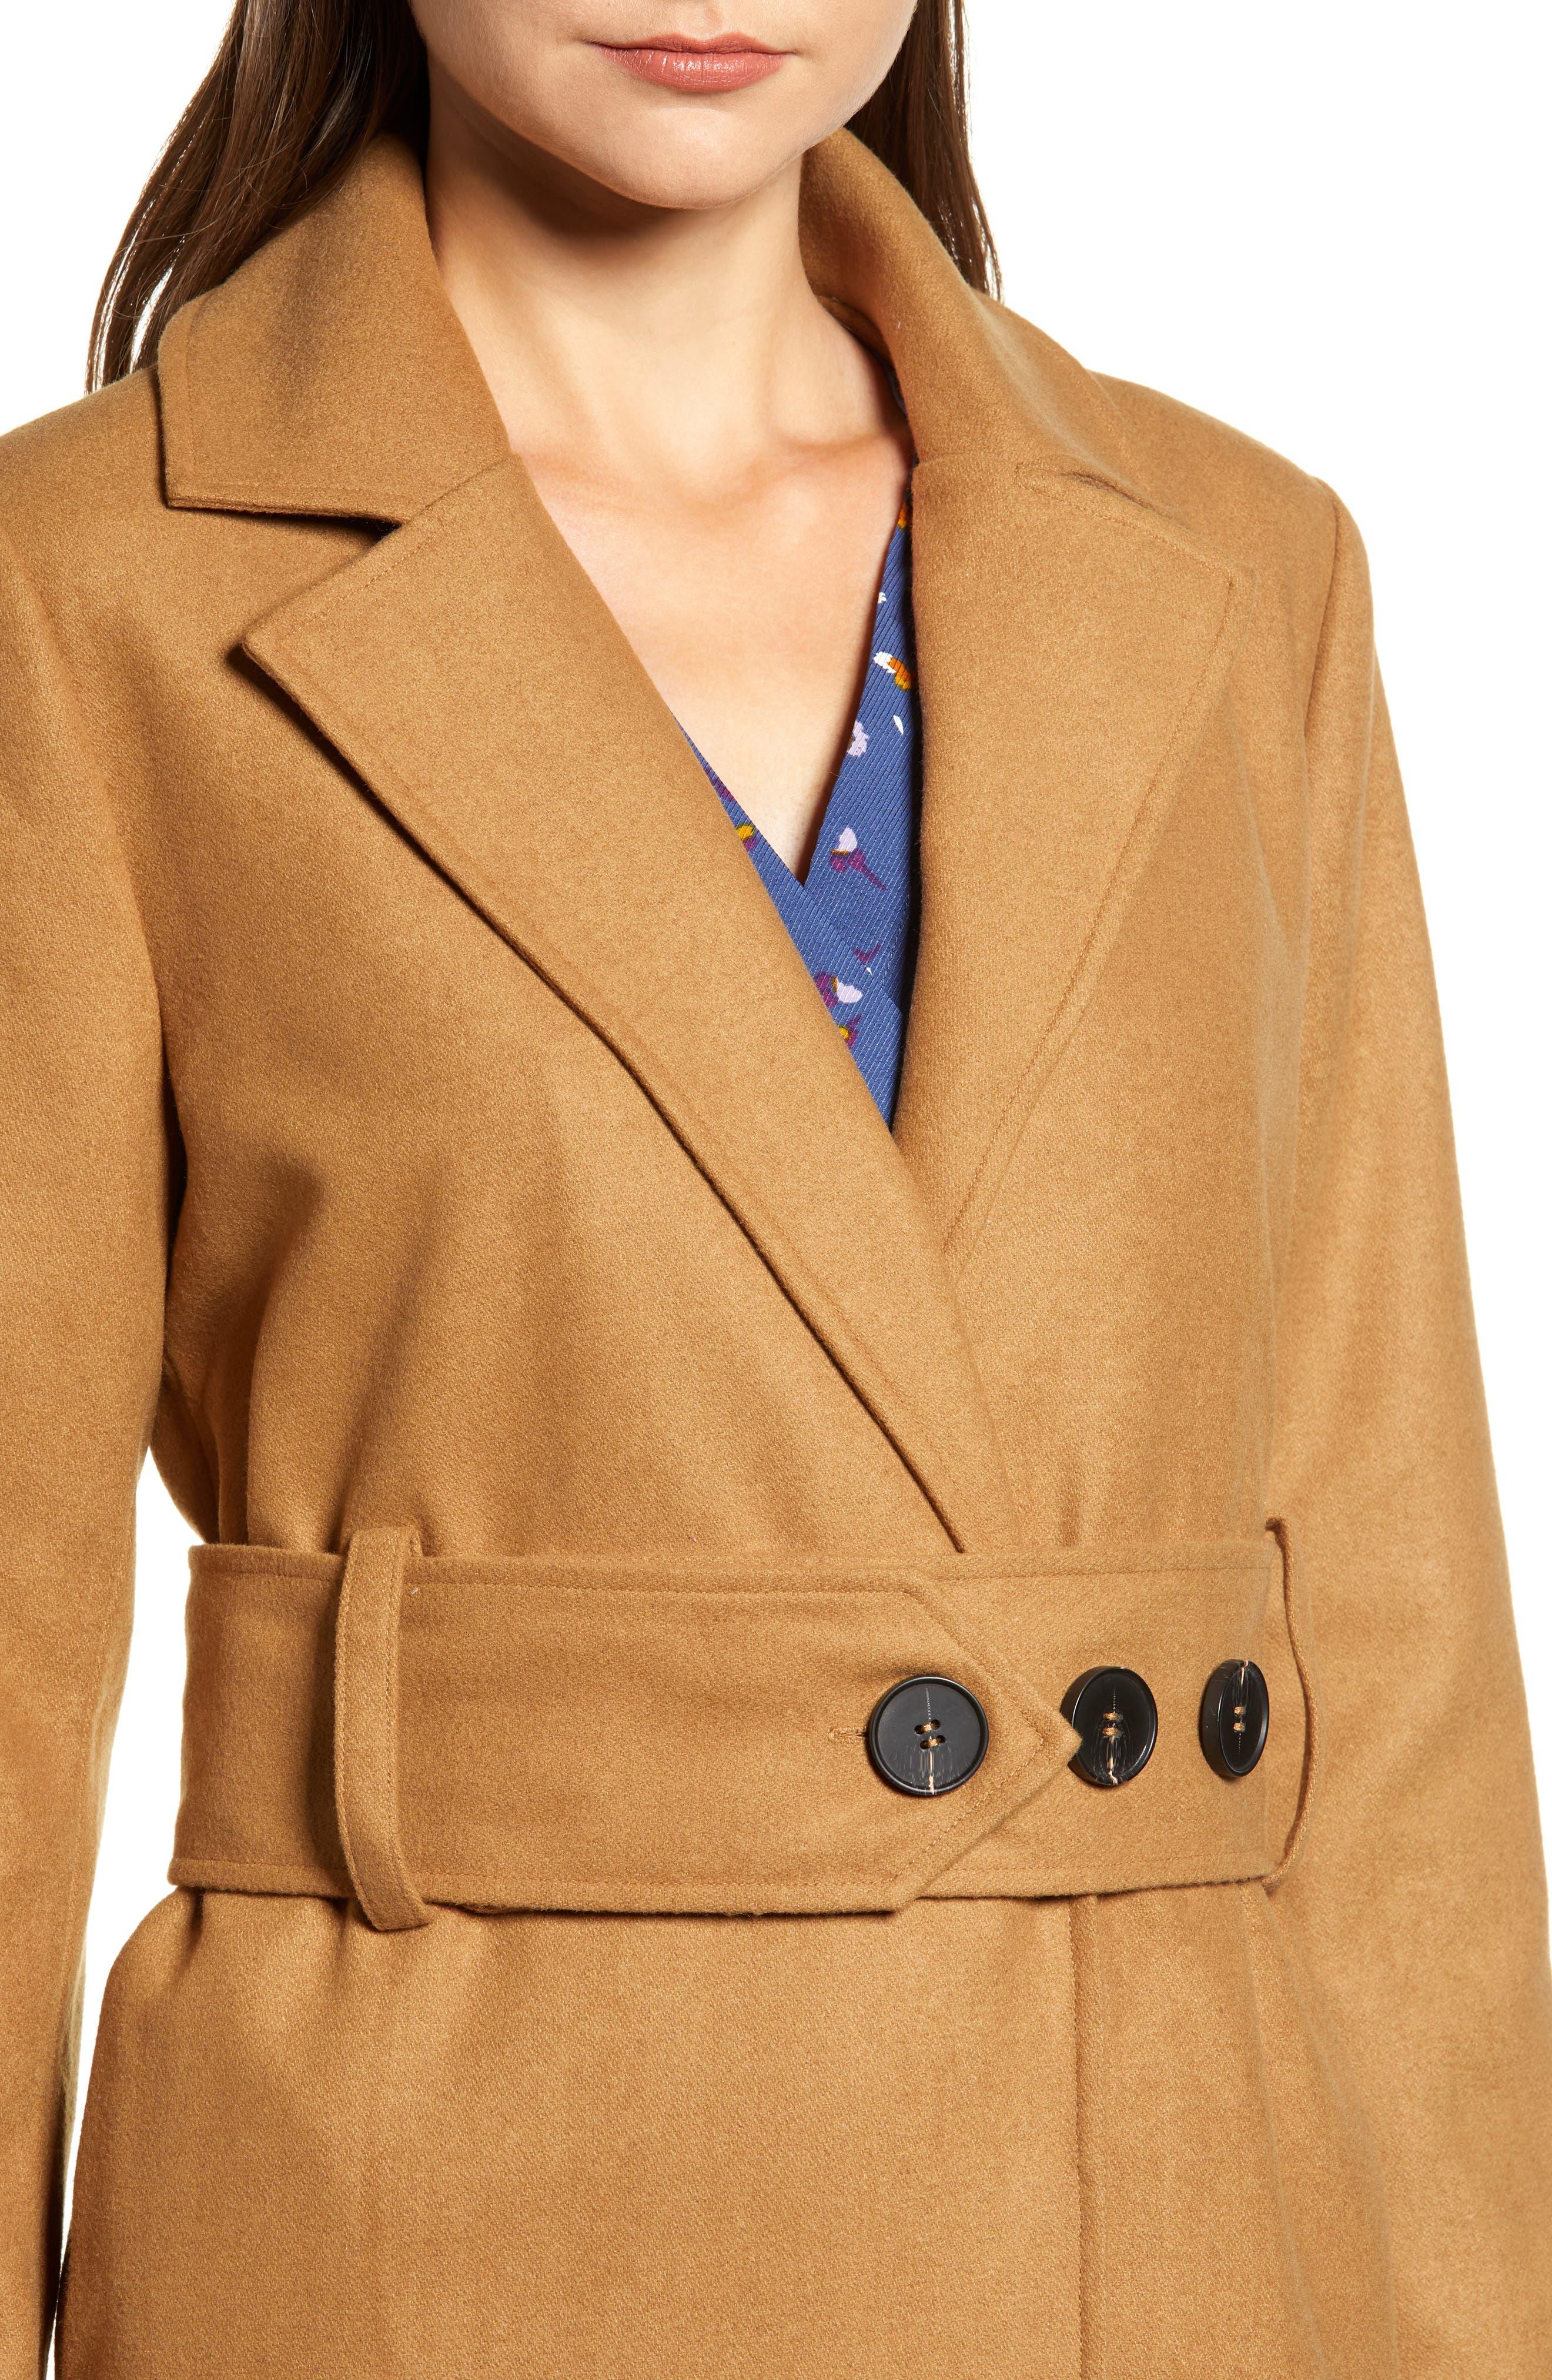 Chriselle Lim Victoria Belted Coat,                             Alternate thumbnail 5, color,                             CAMEL